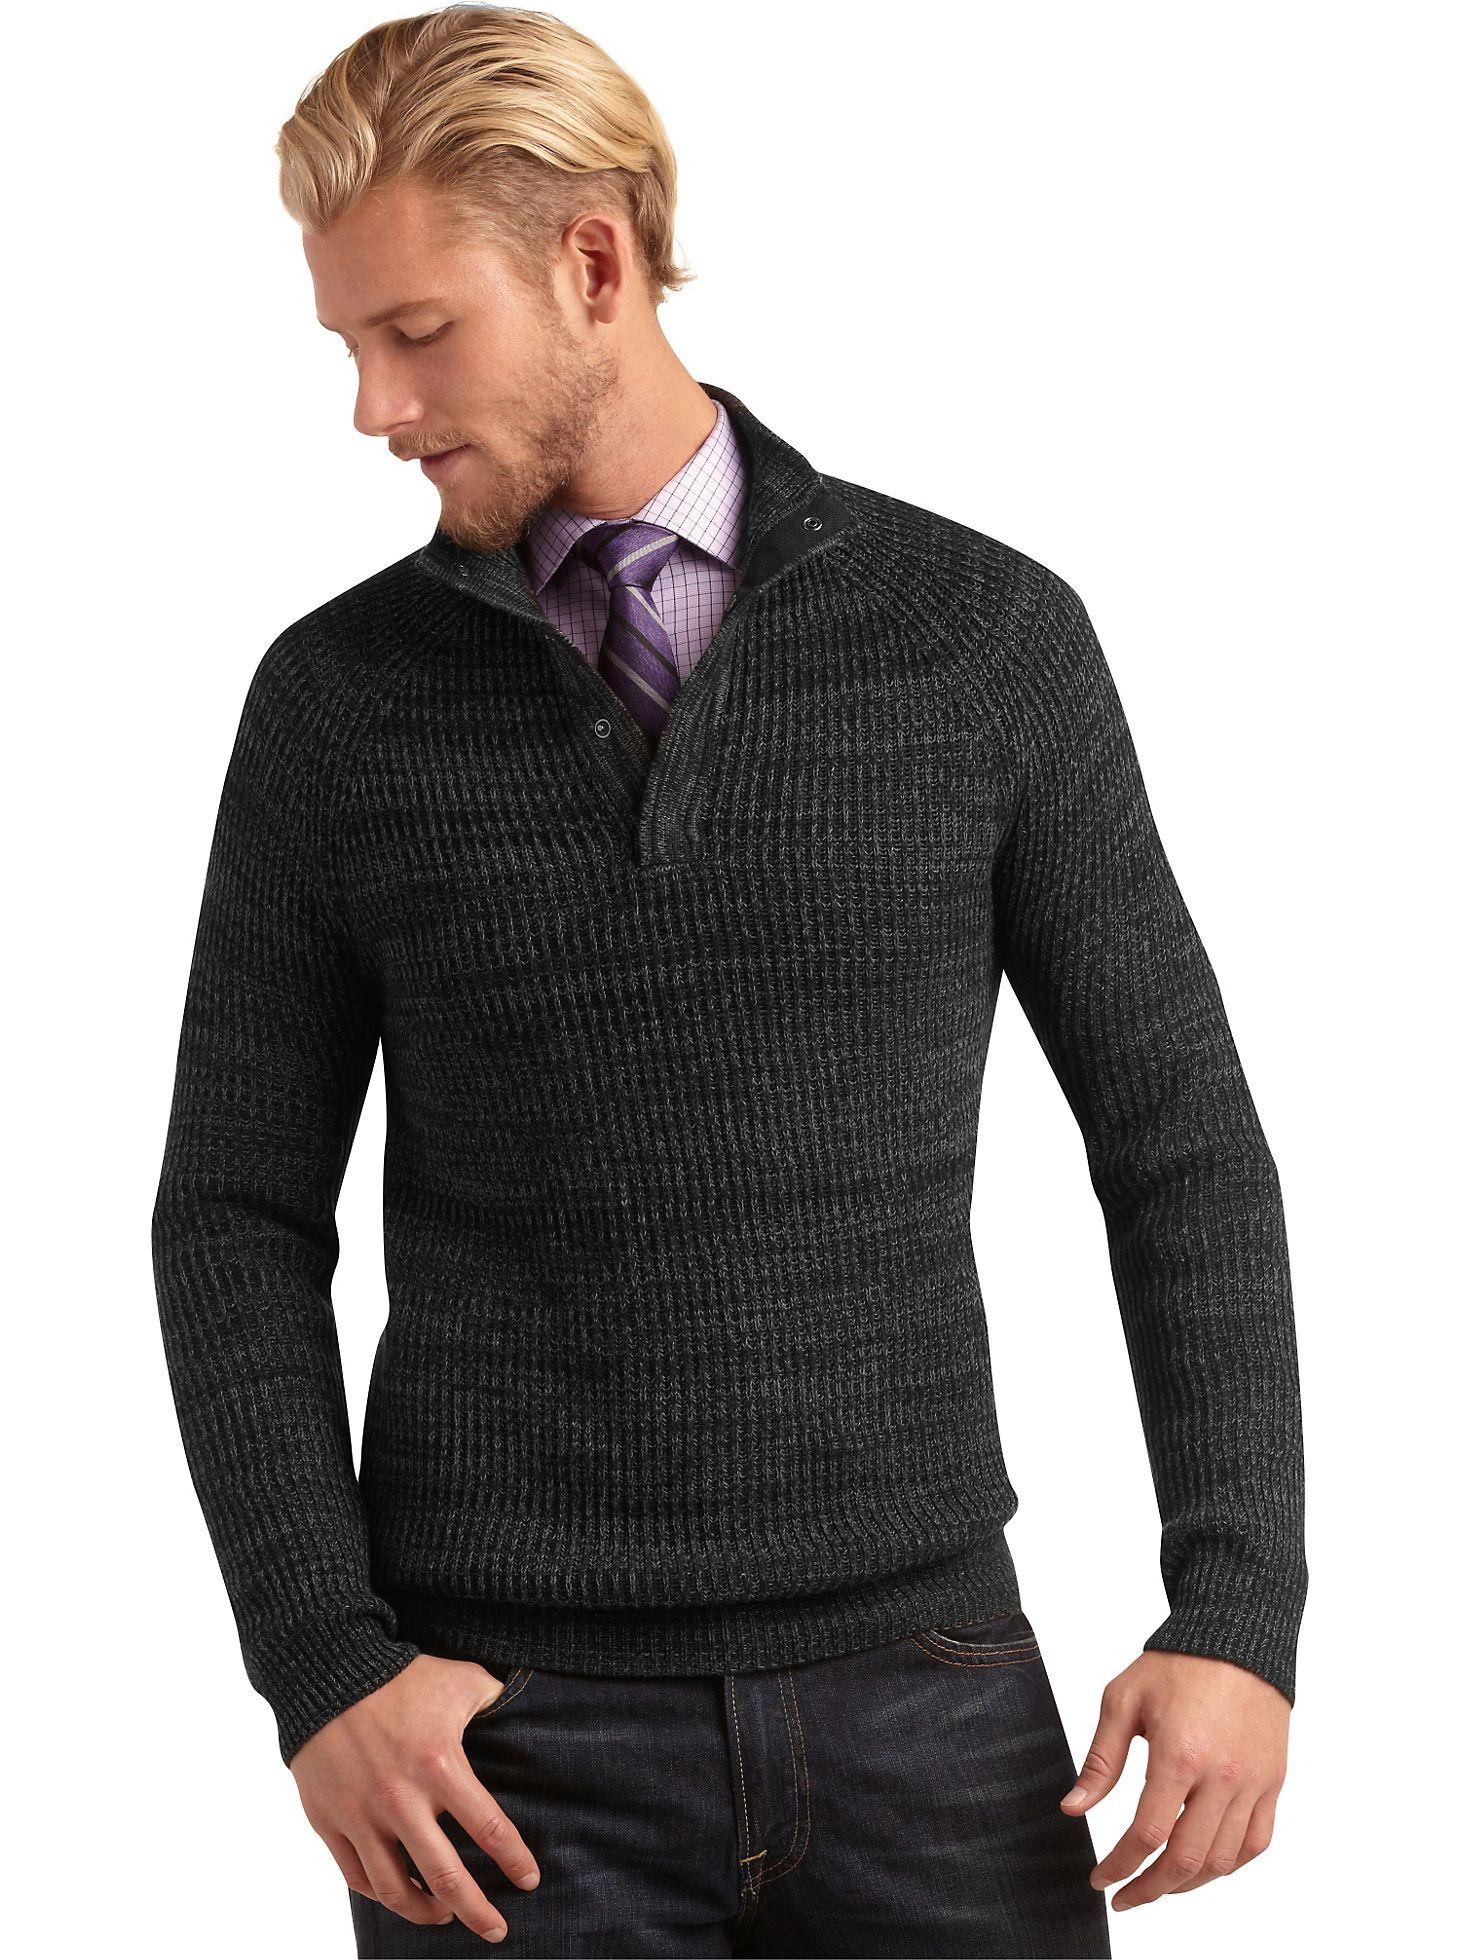 Sweaters & Vests - Pronto Blue Half Button Front Sweater, Black ...